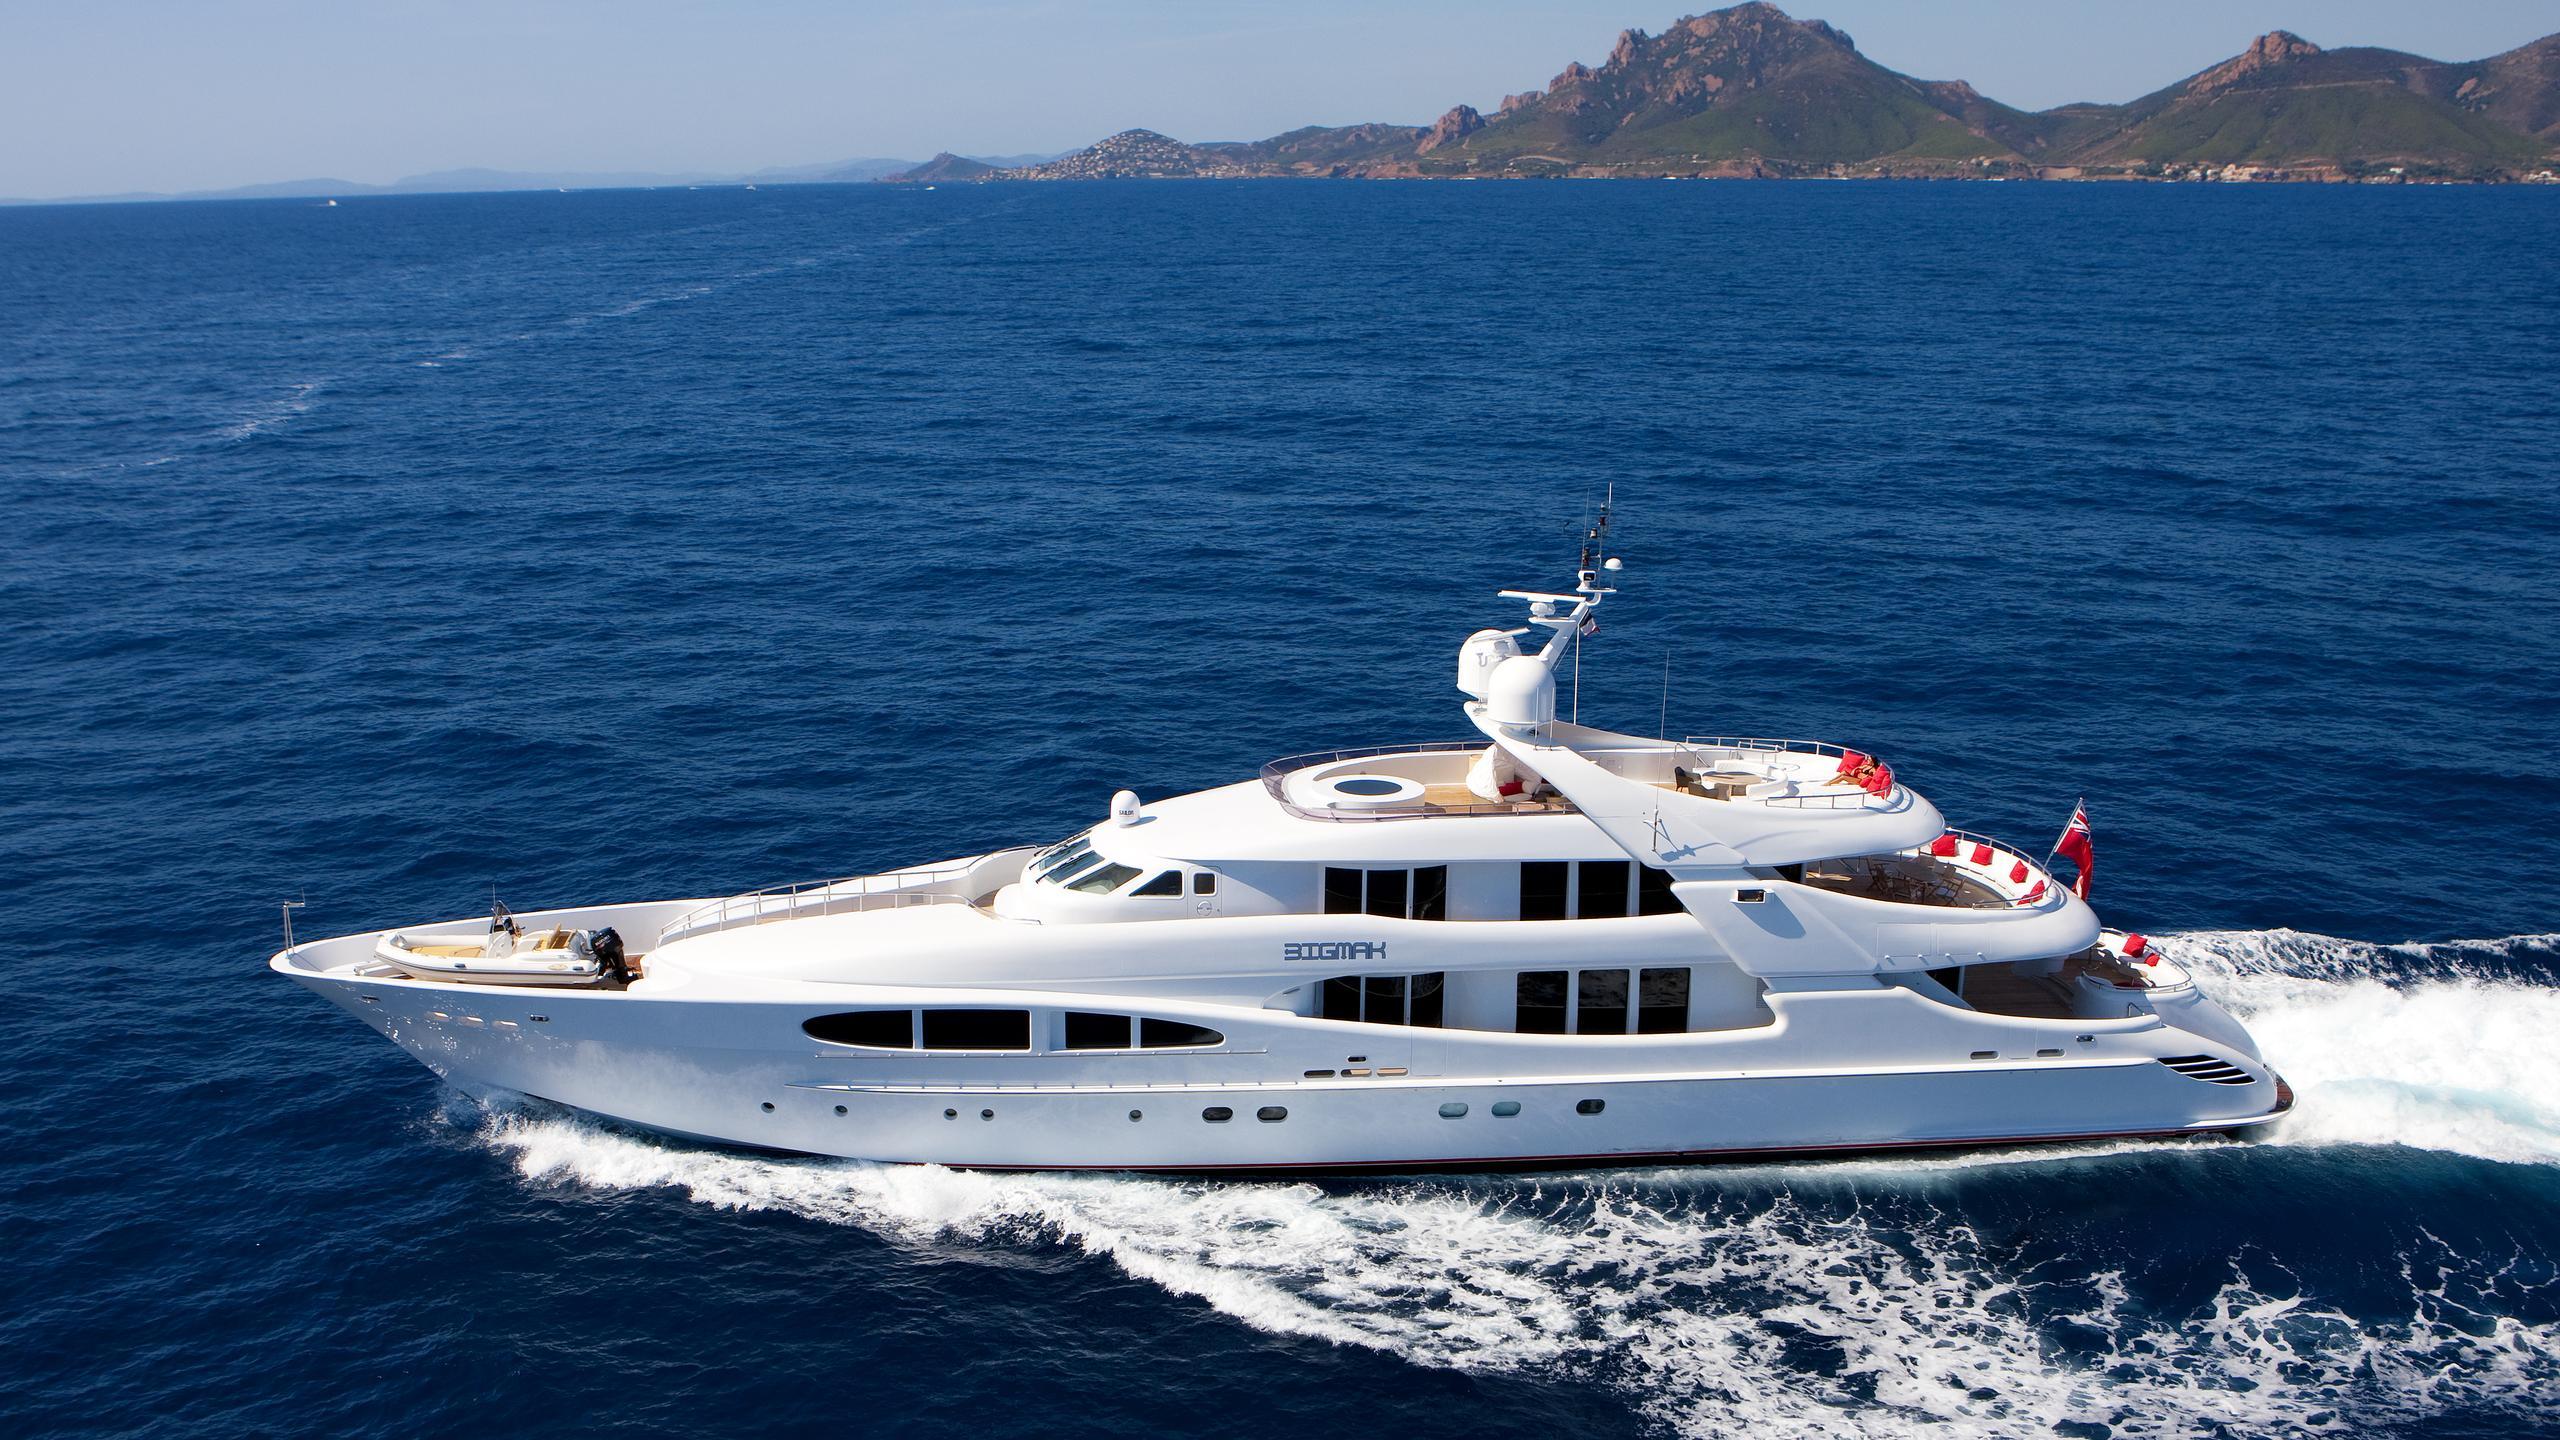 big-mak-yacht-for-sale-profile